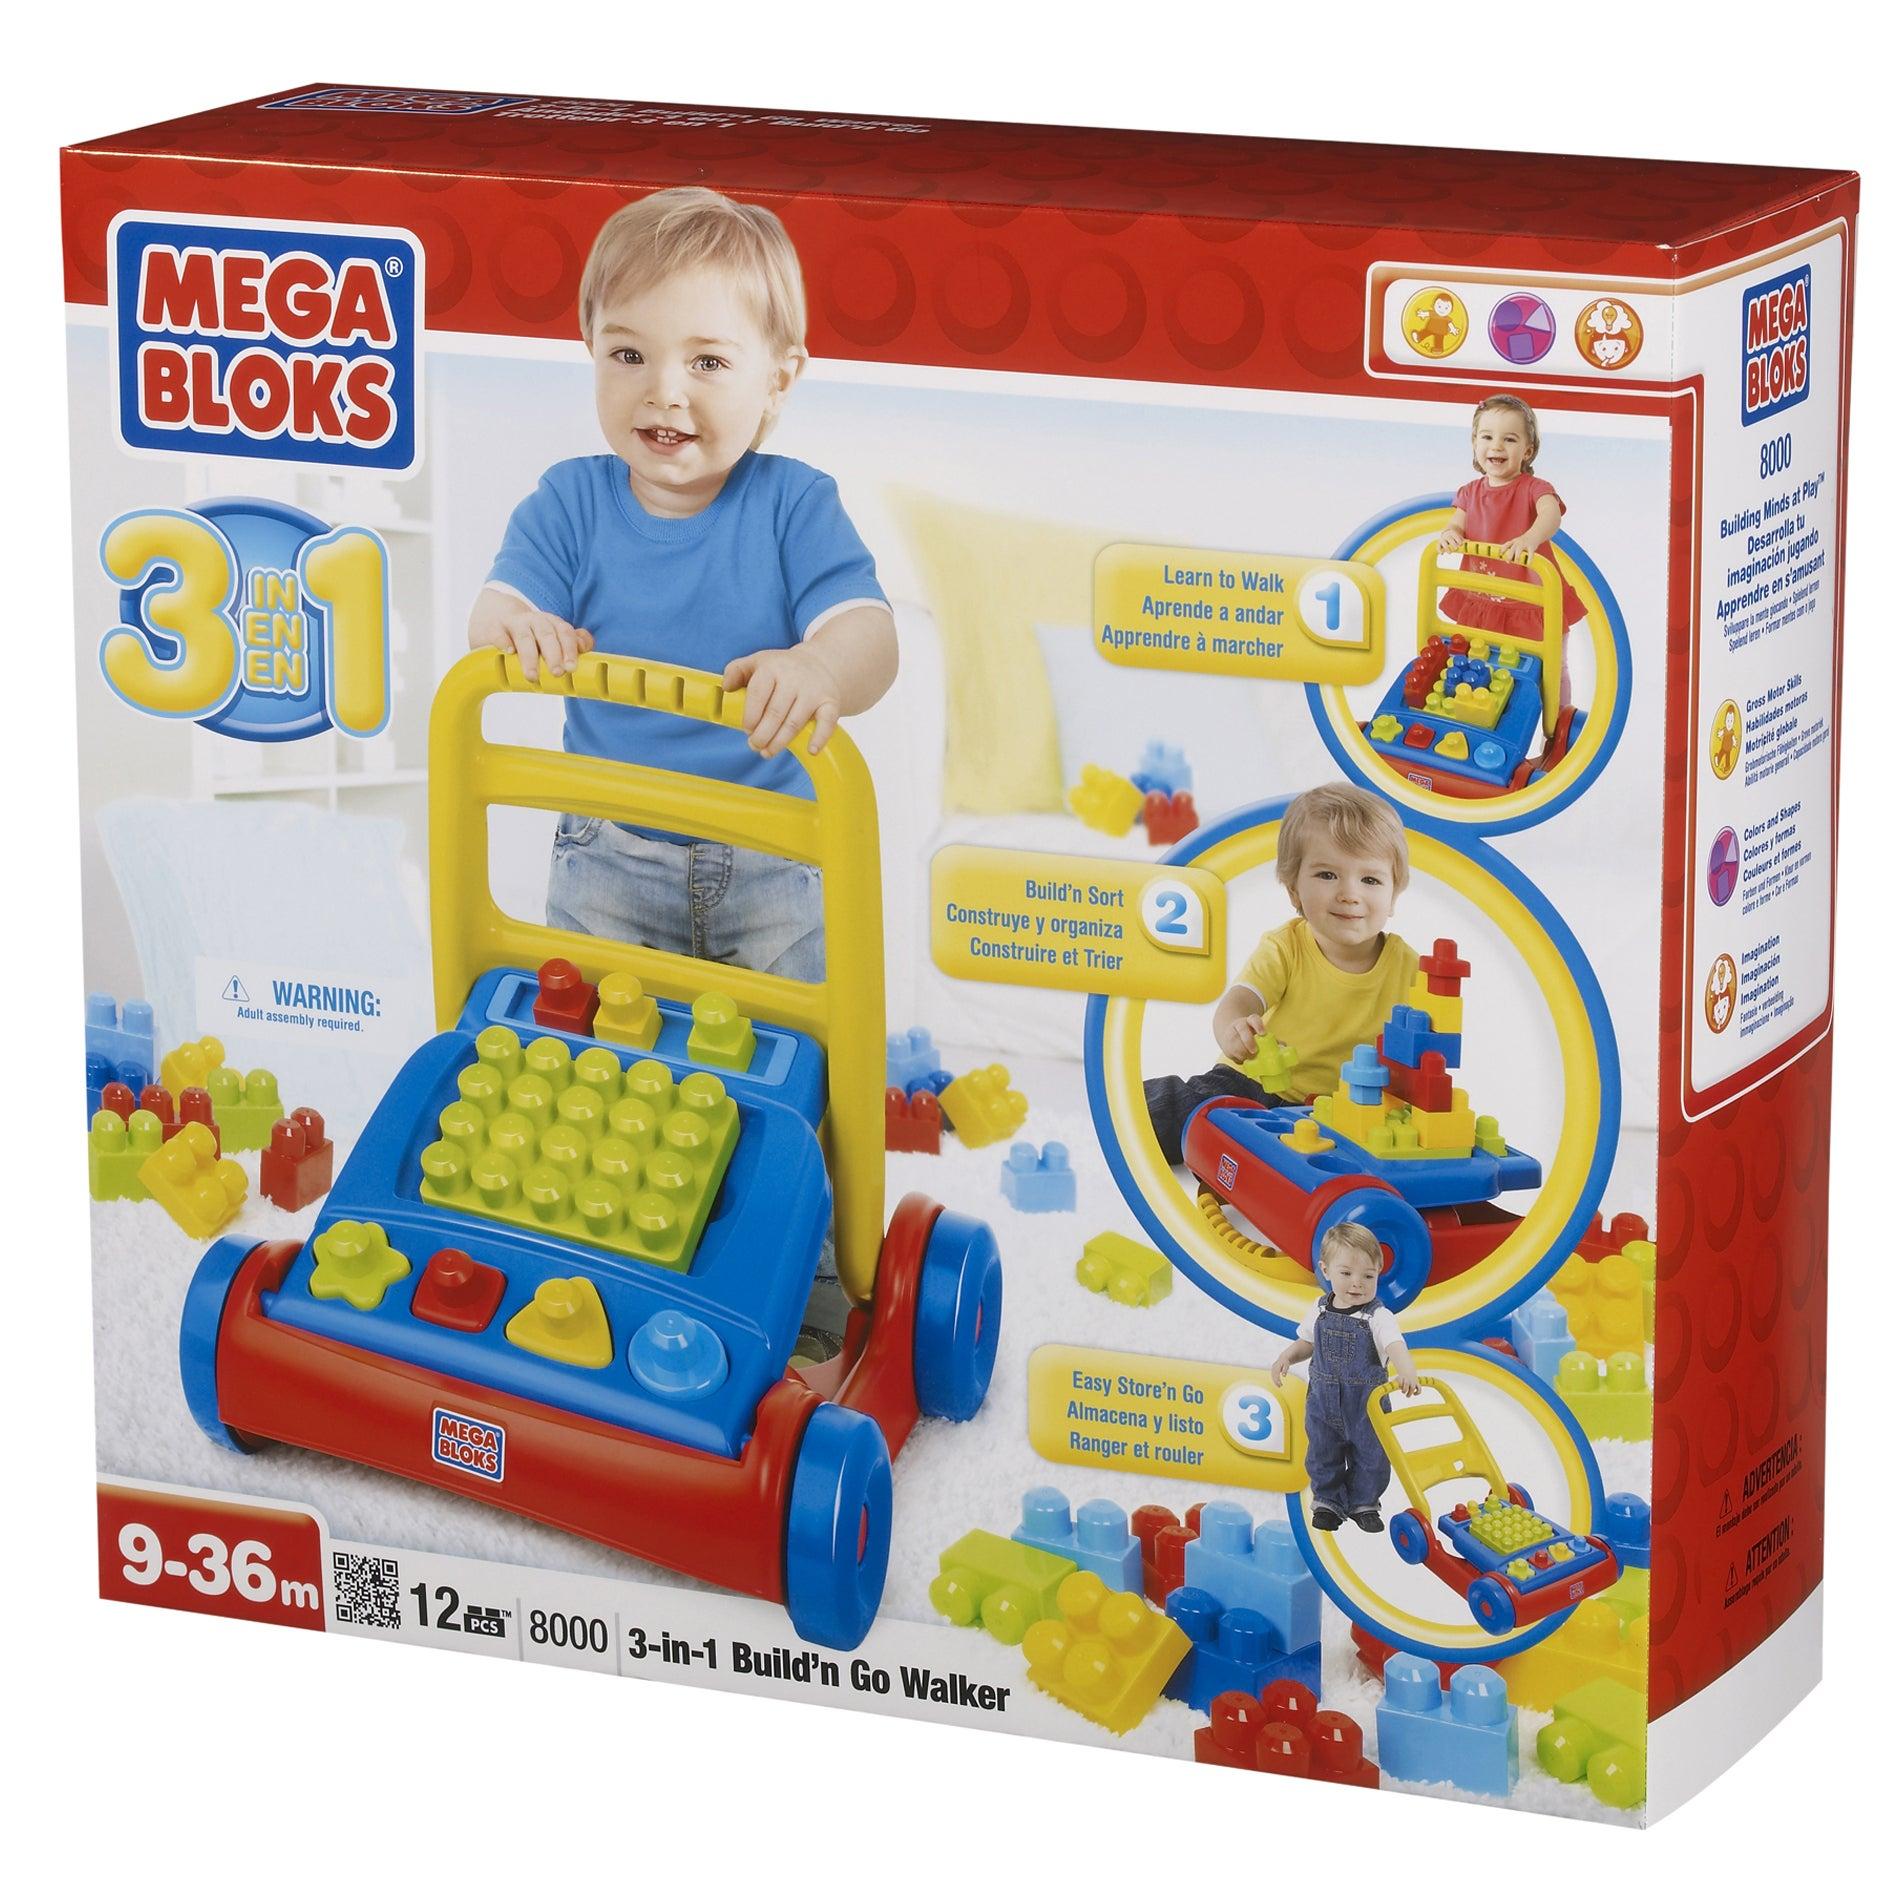 Mega Bloks Build'n Go 3-in-1 Walker Play Set